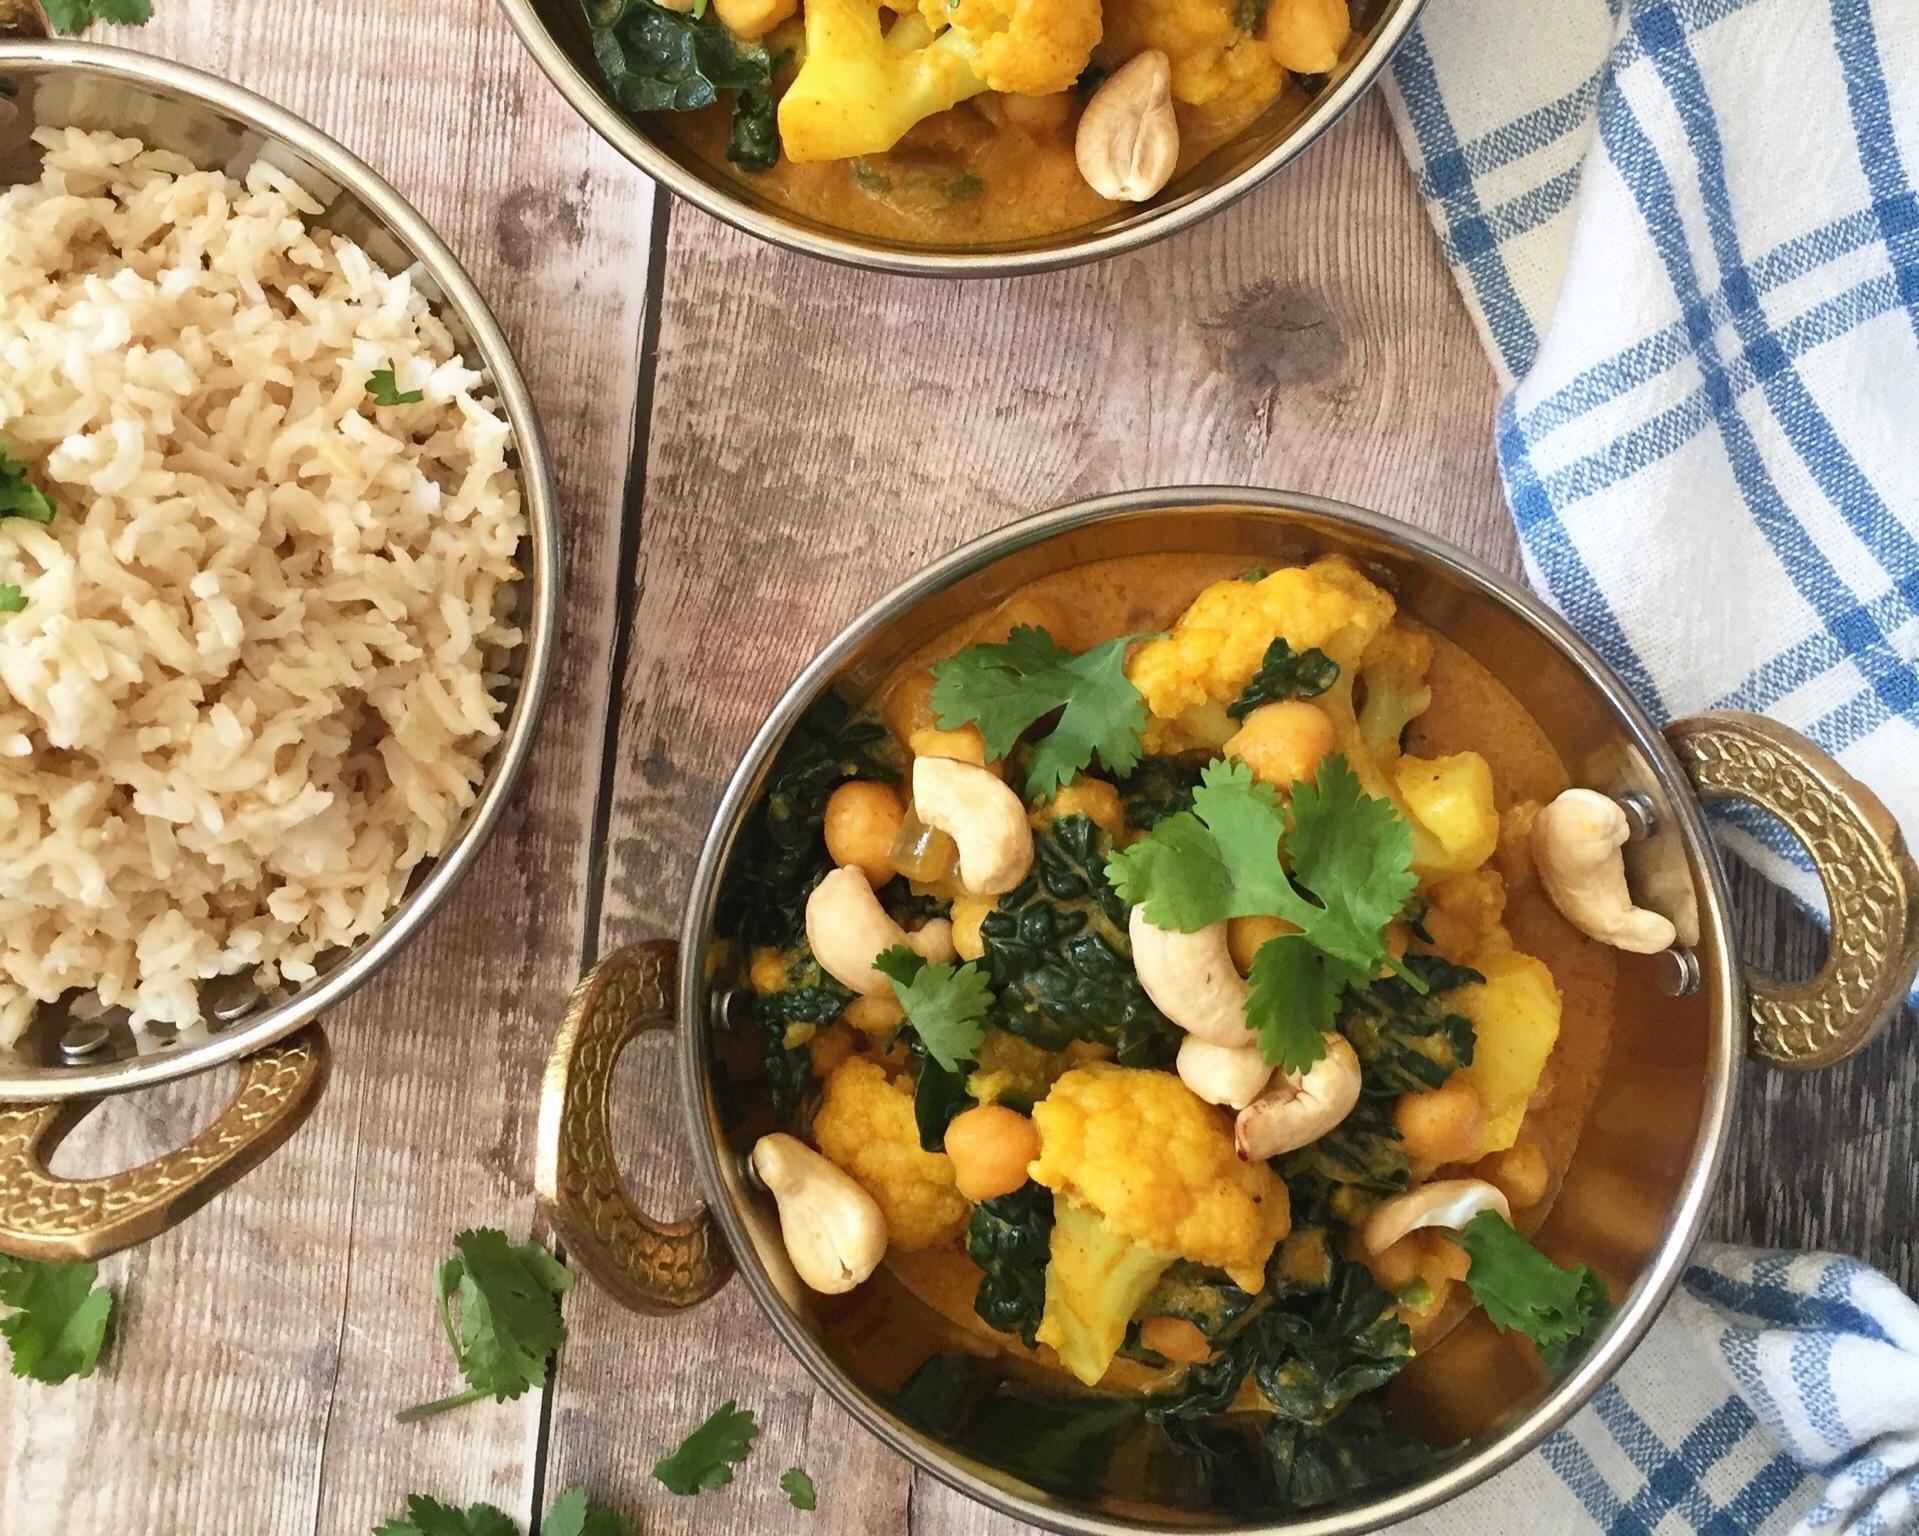 Creamy+Cauliflower%2C+Kale+%26+Chickpea+Curry+Nourish+by+Rebecca.jpg